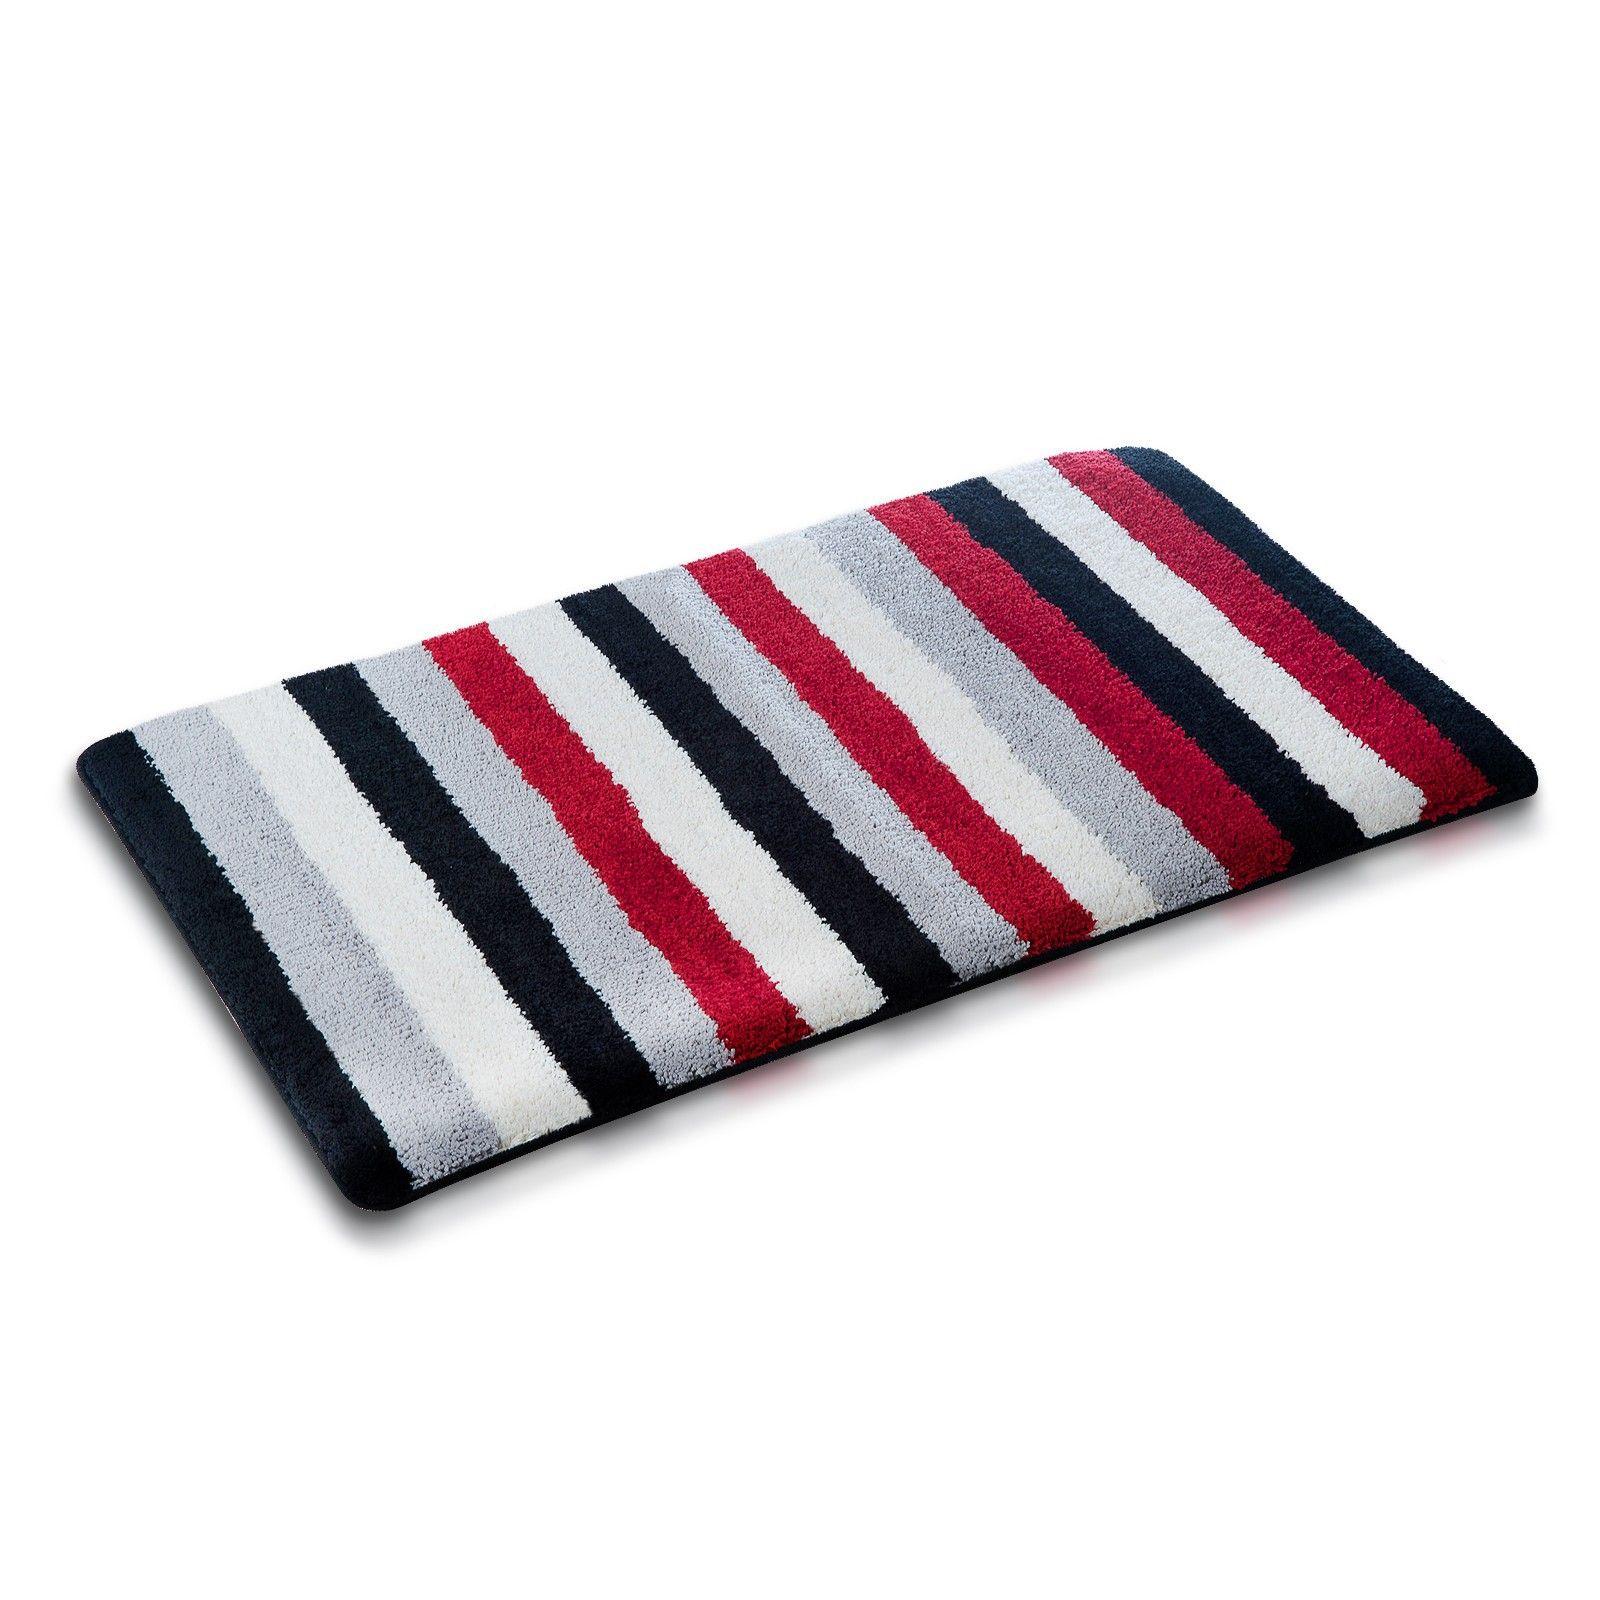 sets bright accessoriesbright rugs impressive bathroom rug bedroom images setsbright ideas red